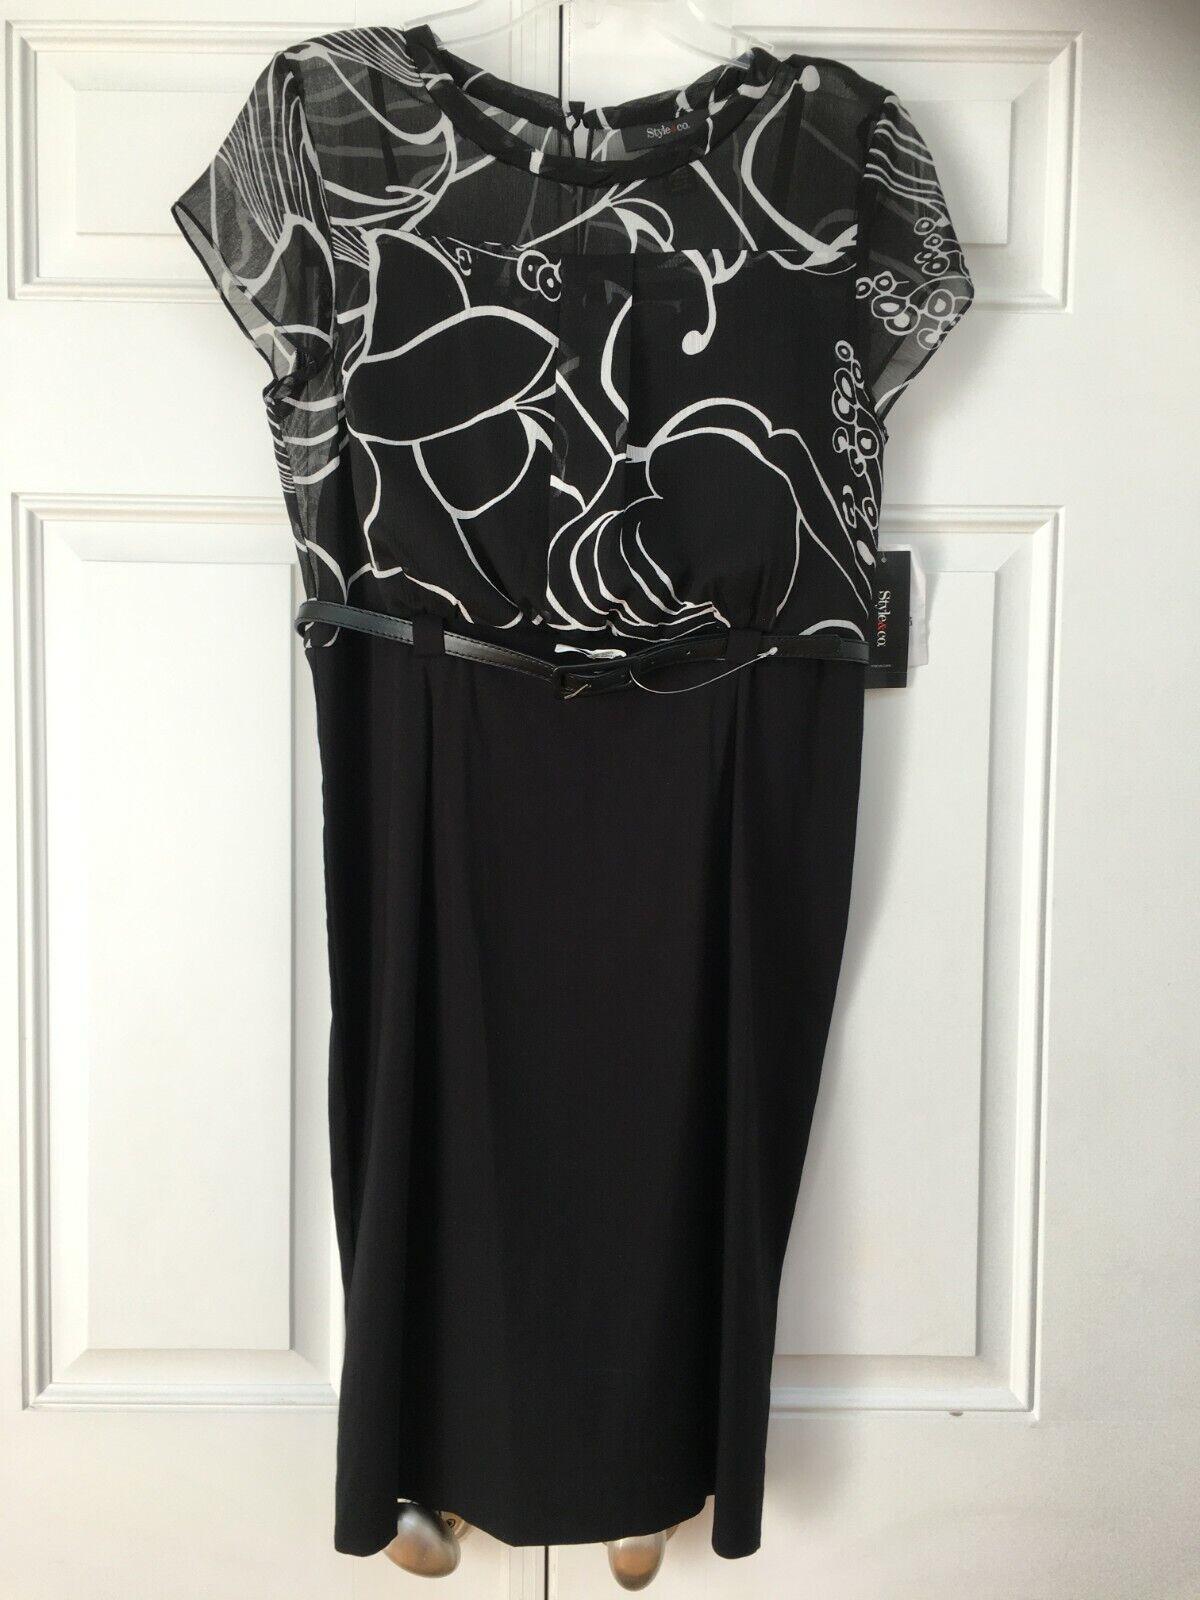 NEW Women's Black/White Lined Chiffon TOP & Black Skirt Dress w/ Belt Size 8/10